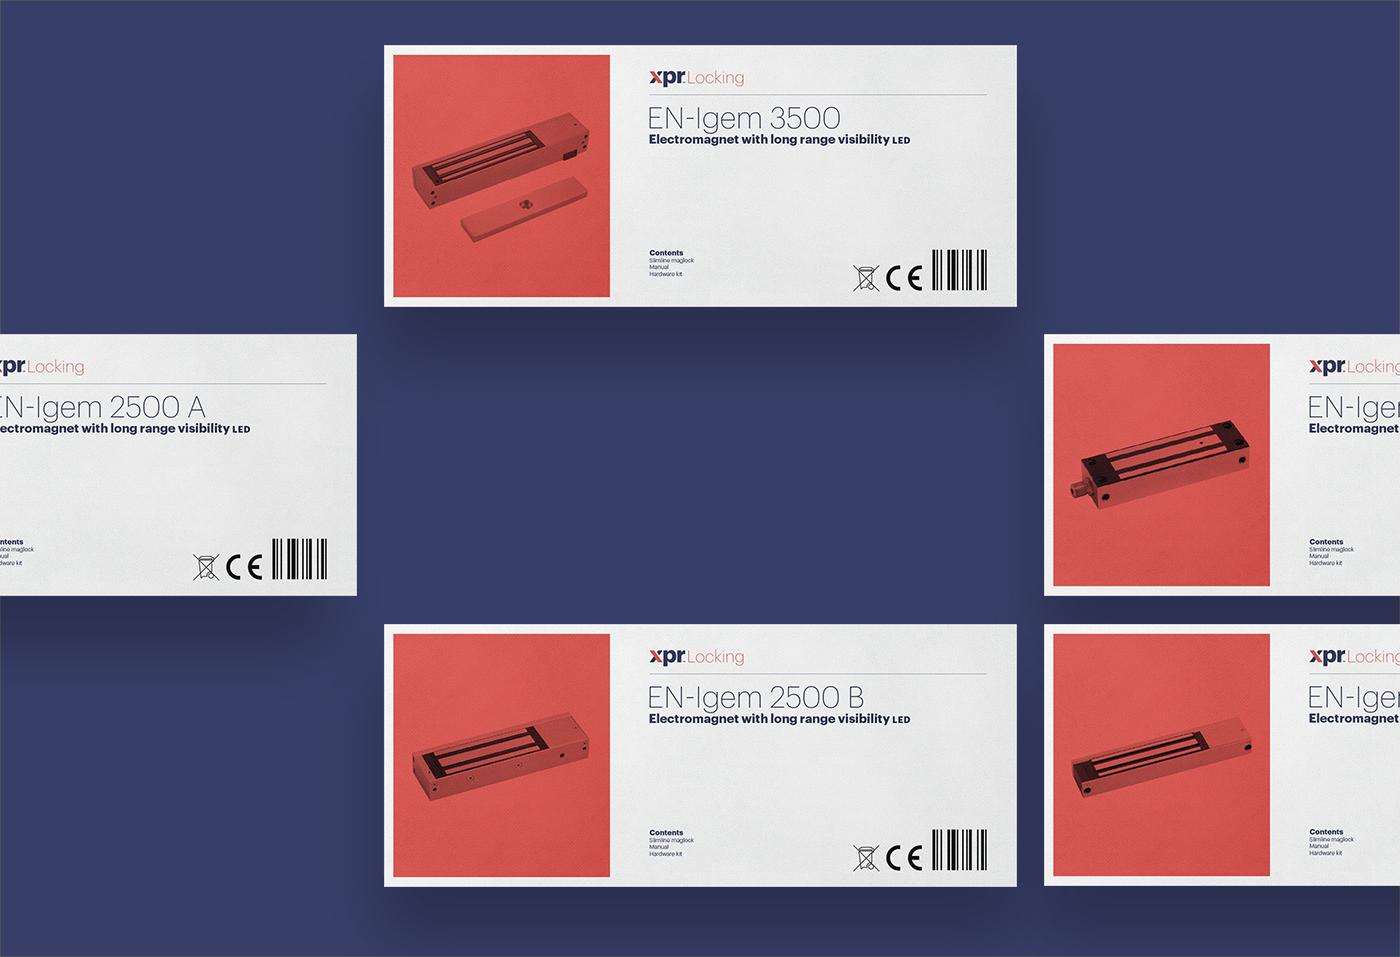 pixelarte-estudio-diseno-etiquetas-adhesivas-para-xpr